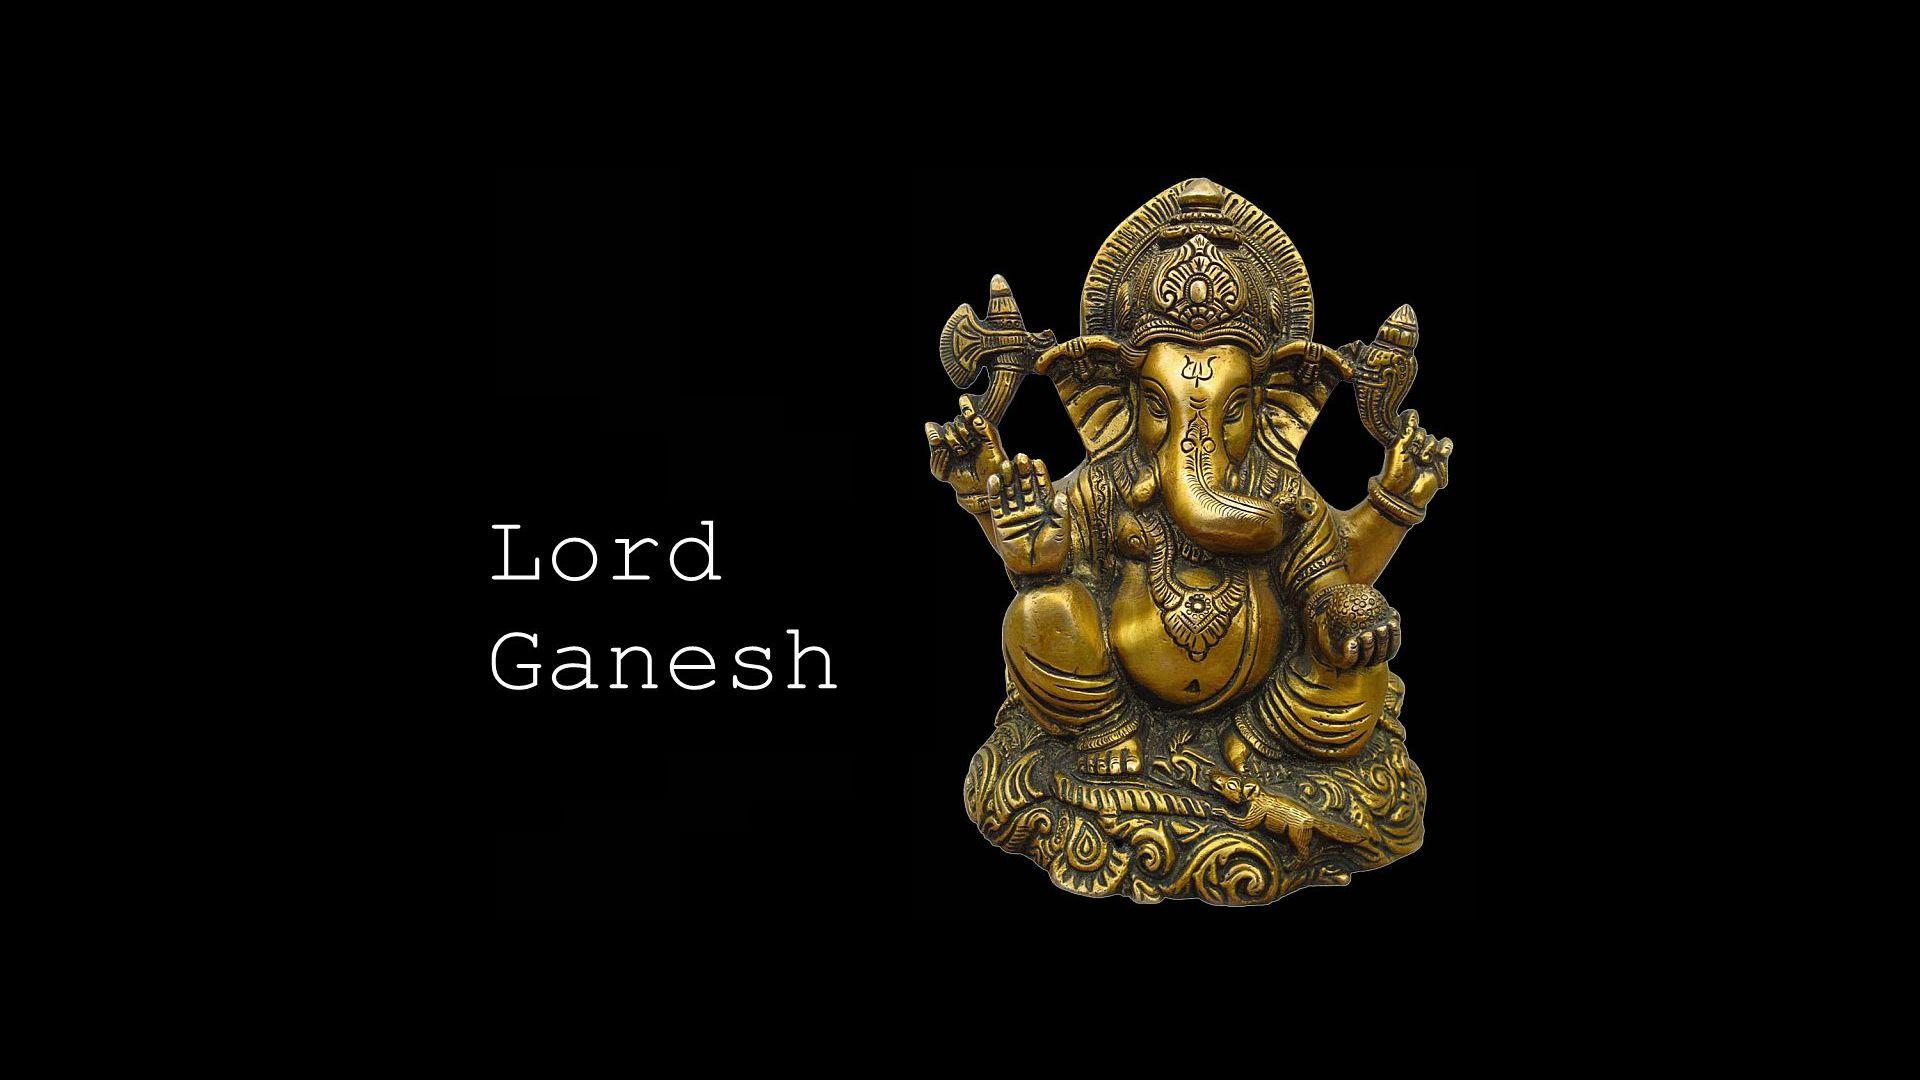 Download Lord Ganesha HD Desktop Wallpaper